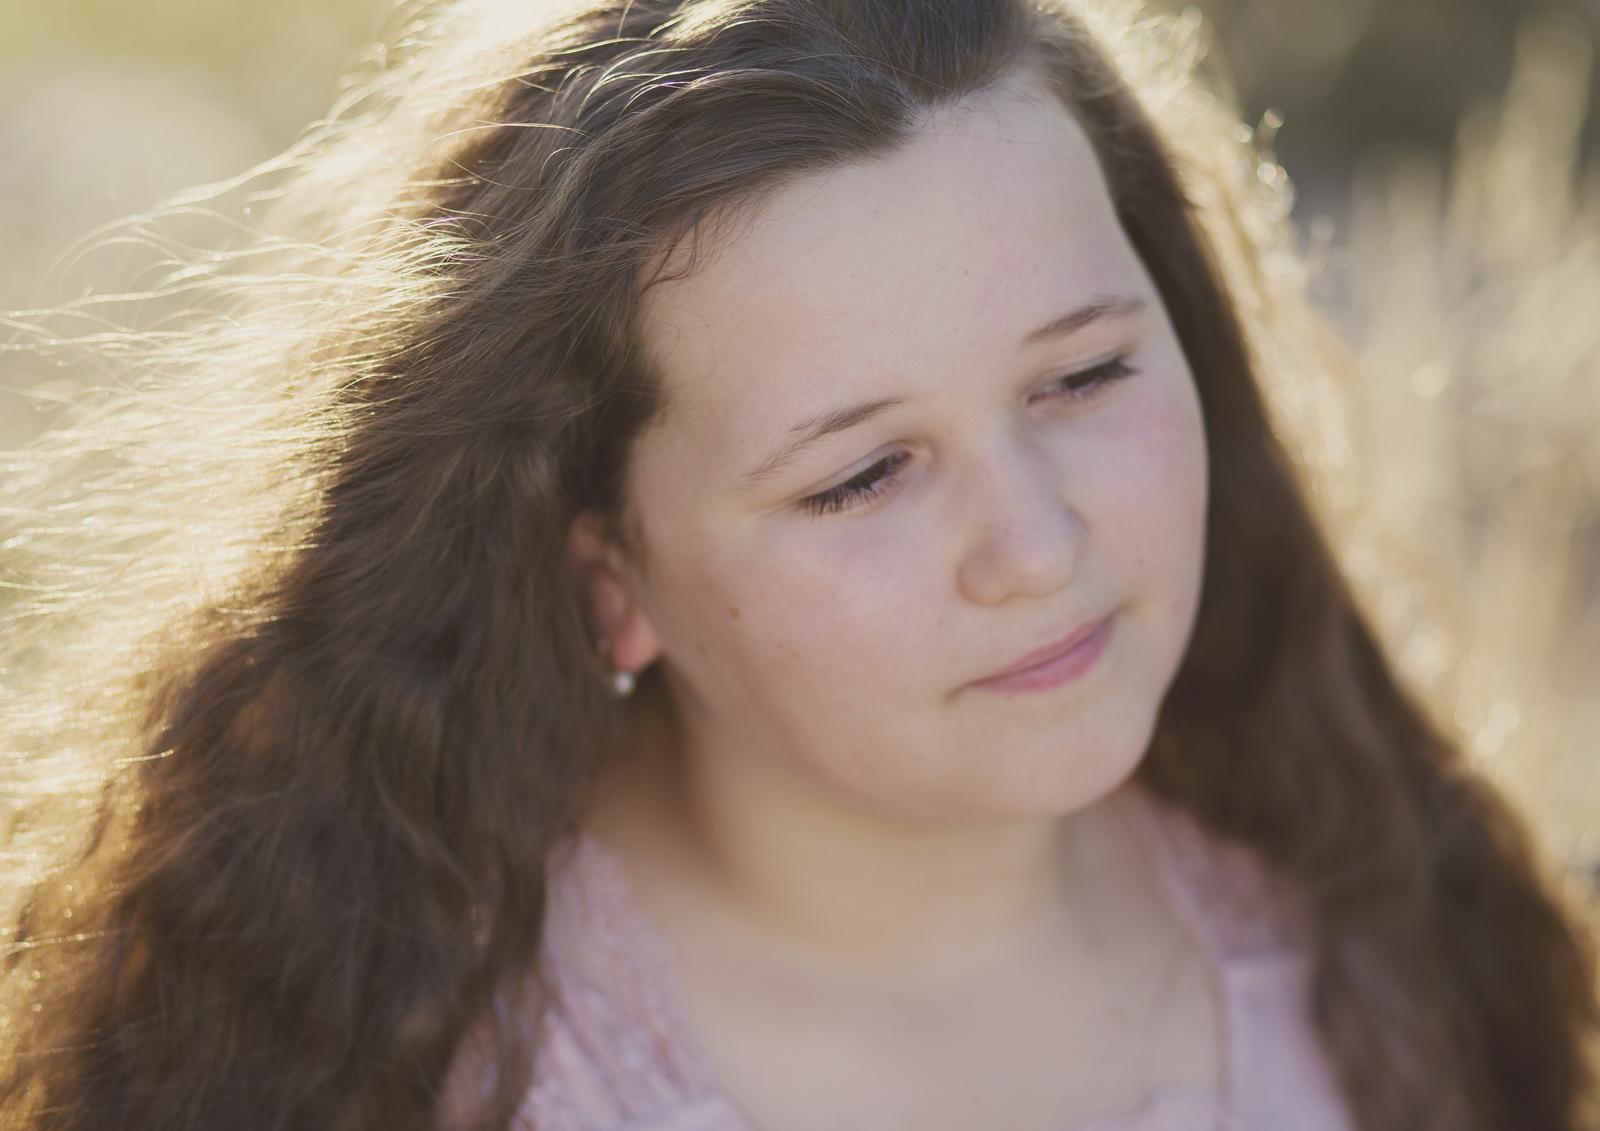 Back lit image of Tween Girl at the park